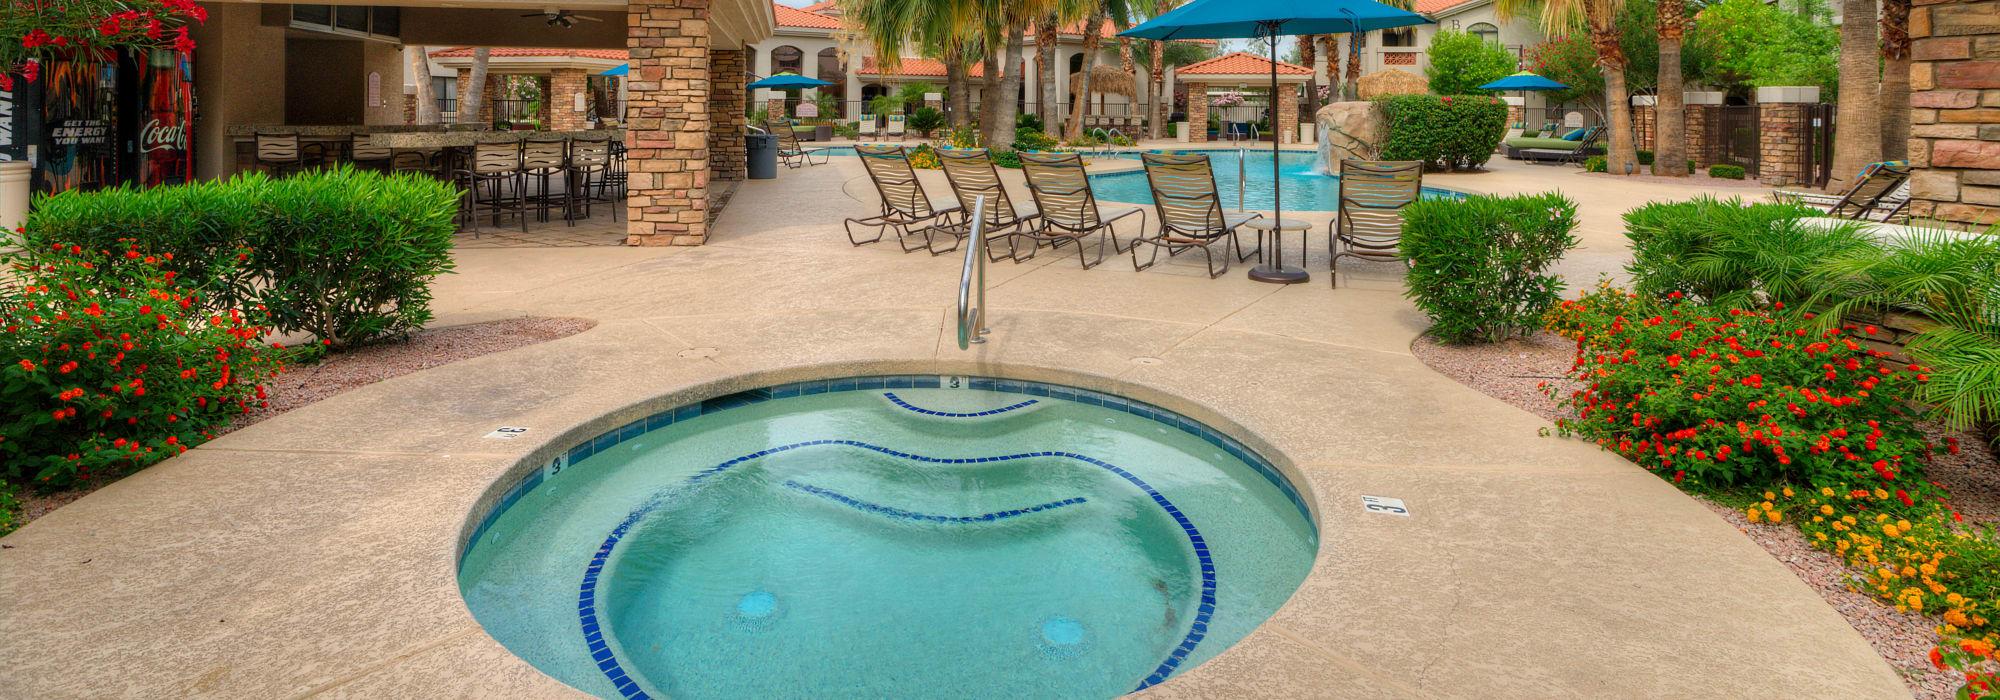 Hot tub at San Hacienda in Chandler, Arizona